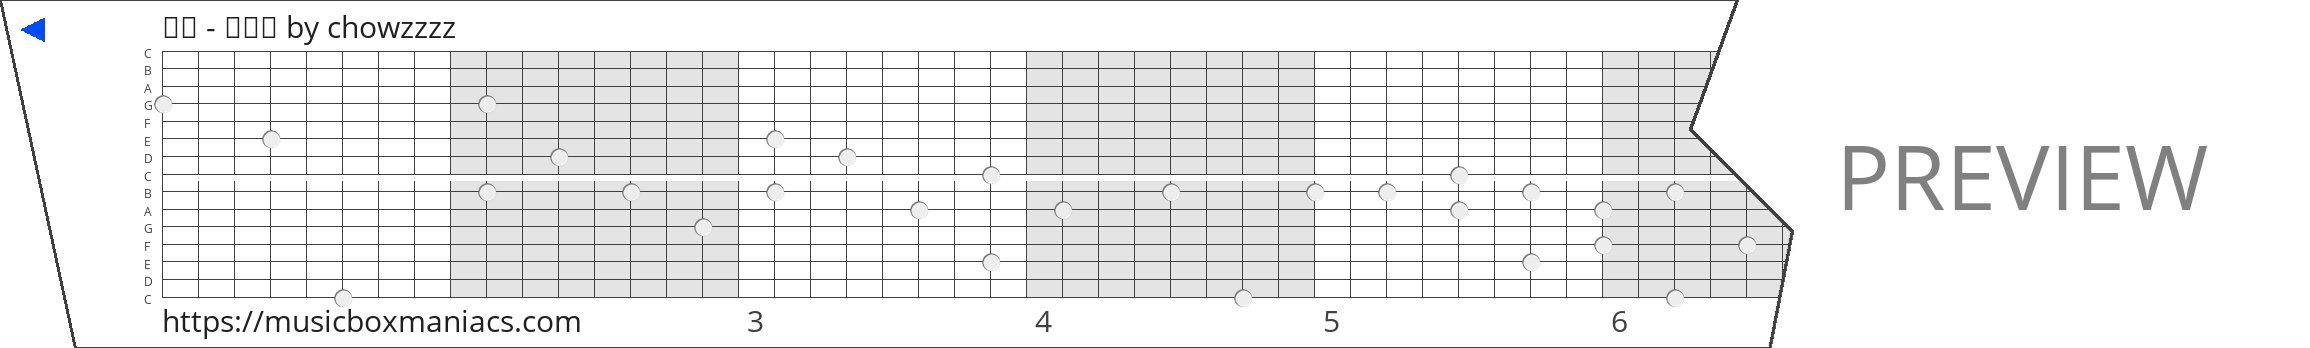 遇见 - 孙燕姿 15 note music box paper strip